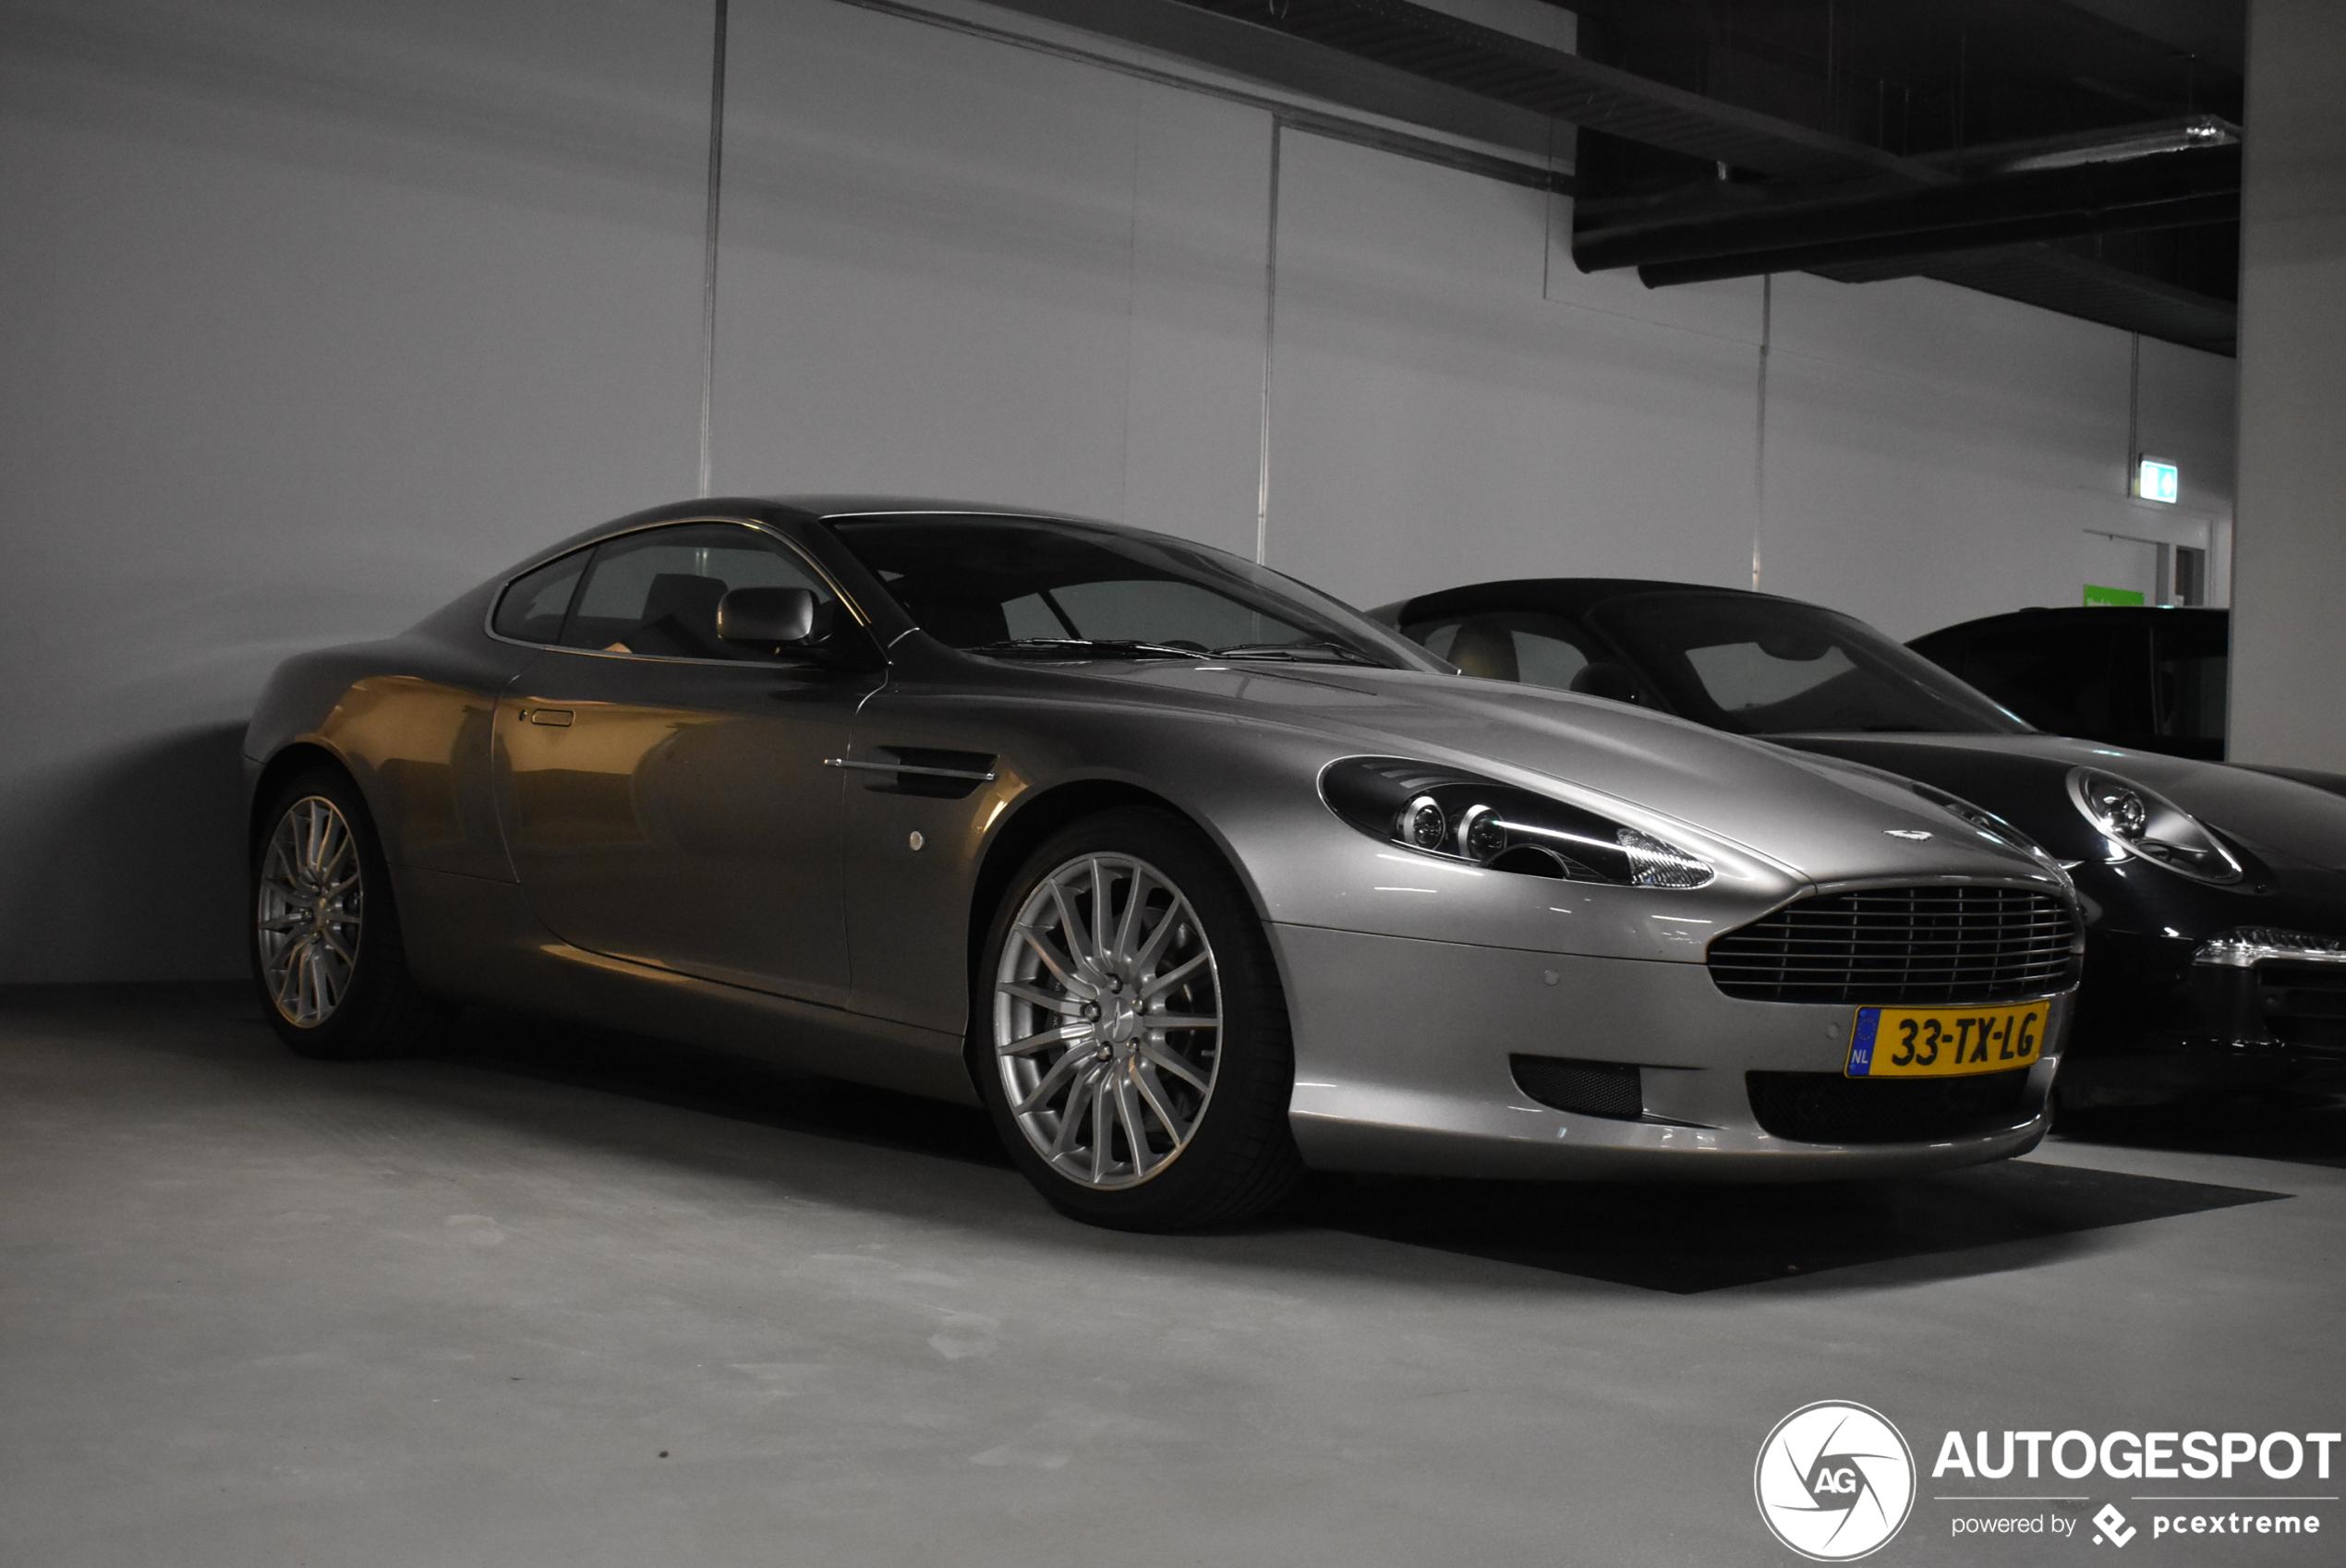 Aston Martin DB9 - 8 May 2020 - Autogespot